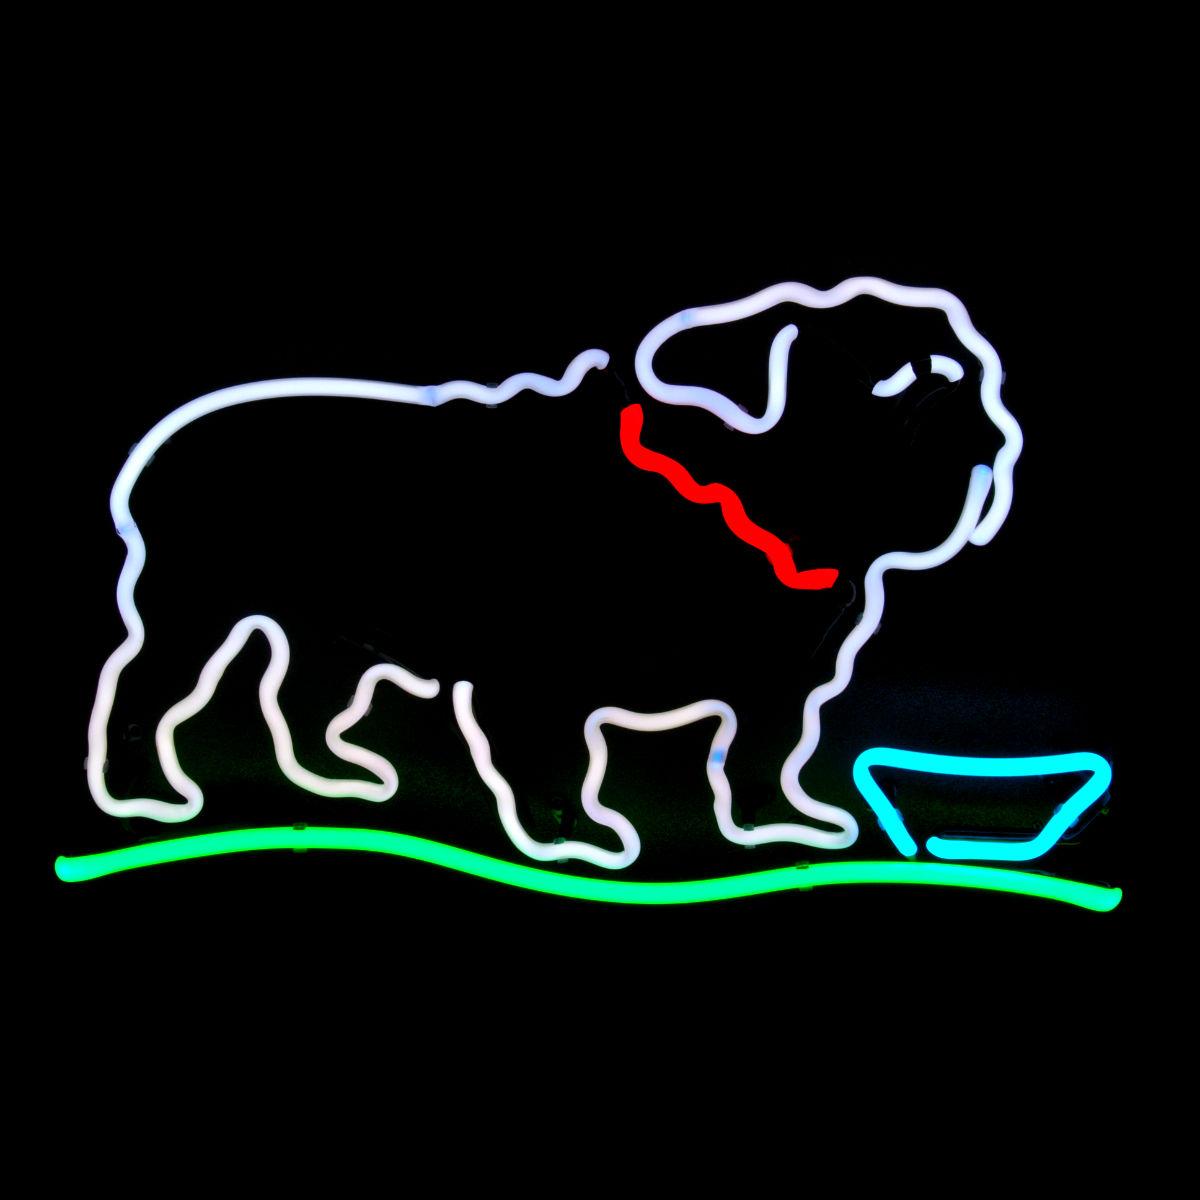 resized neon bulldog.jpg